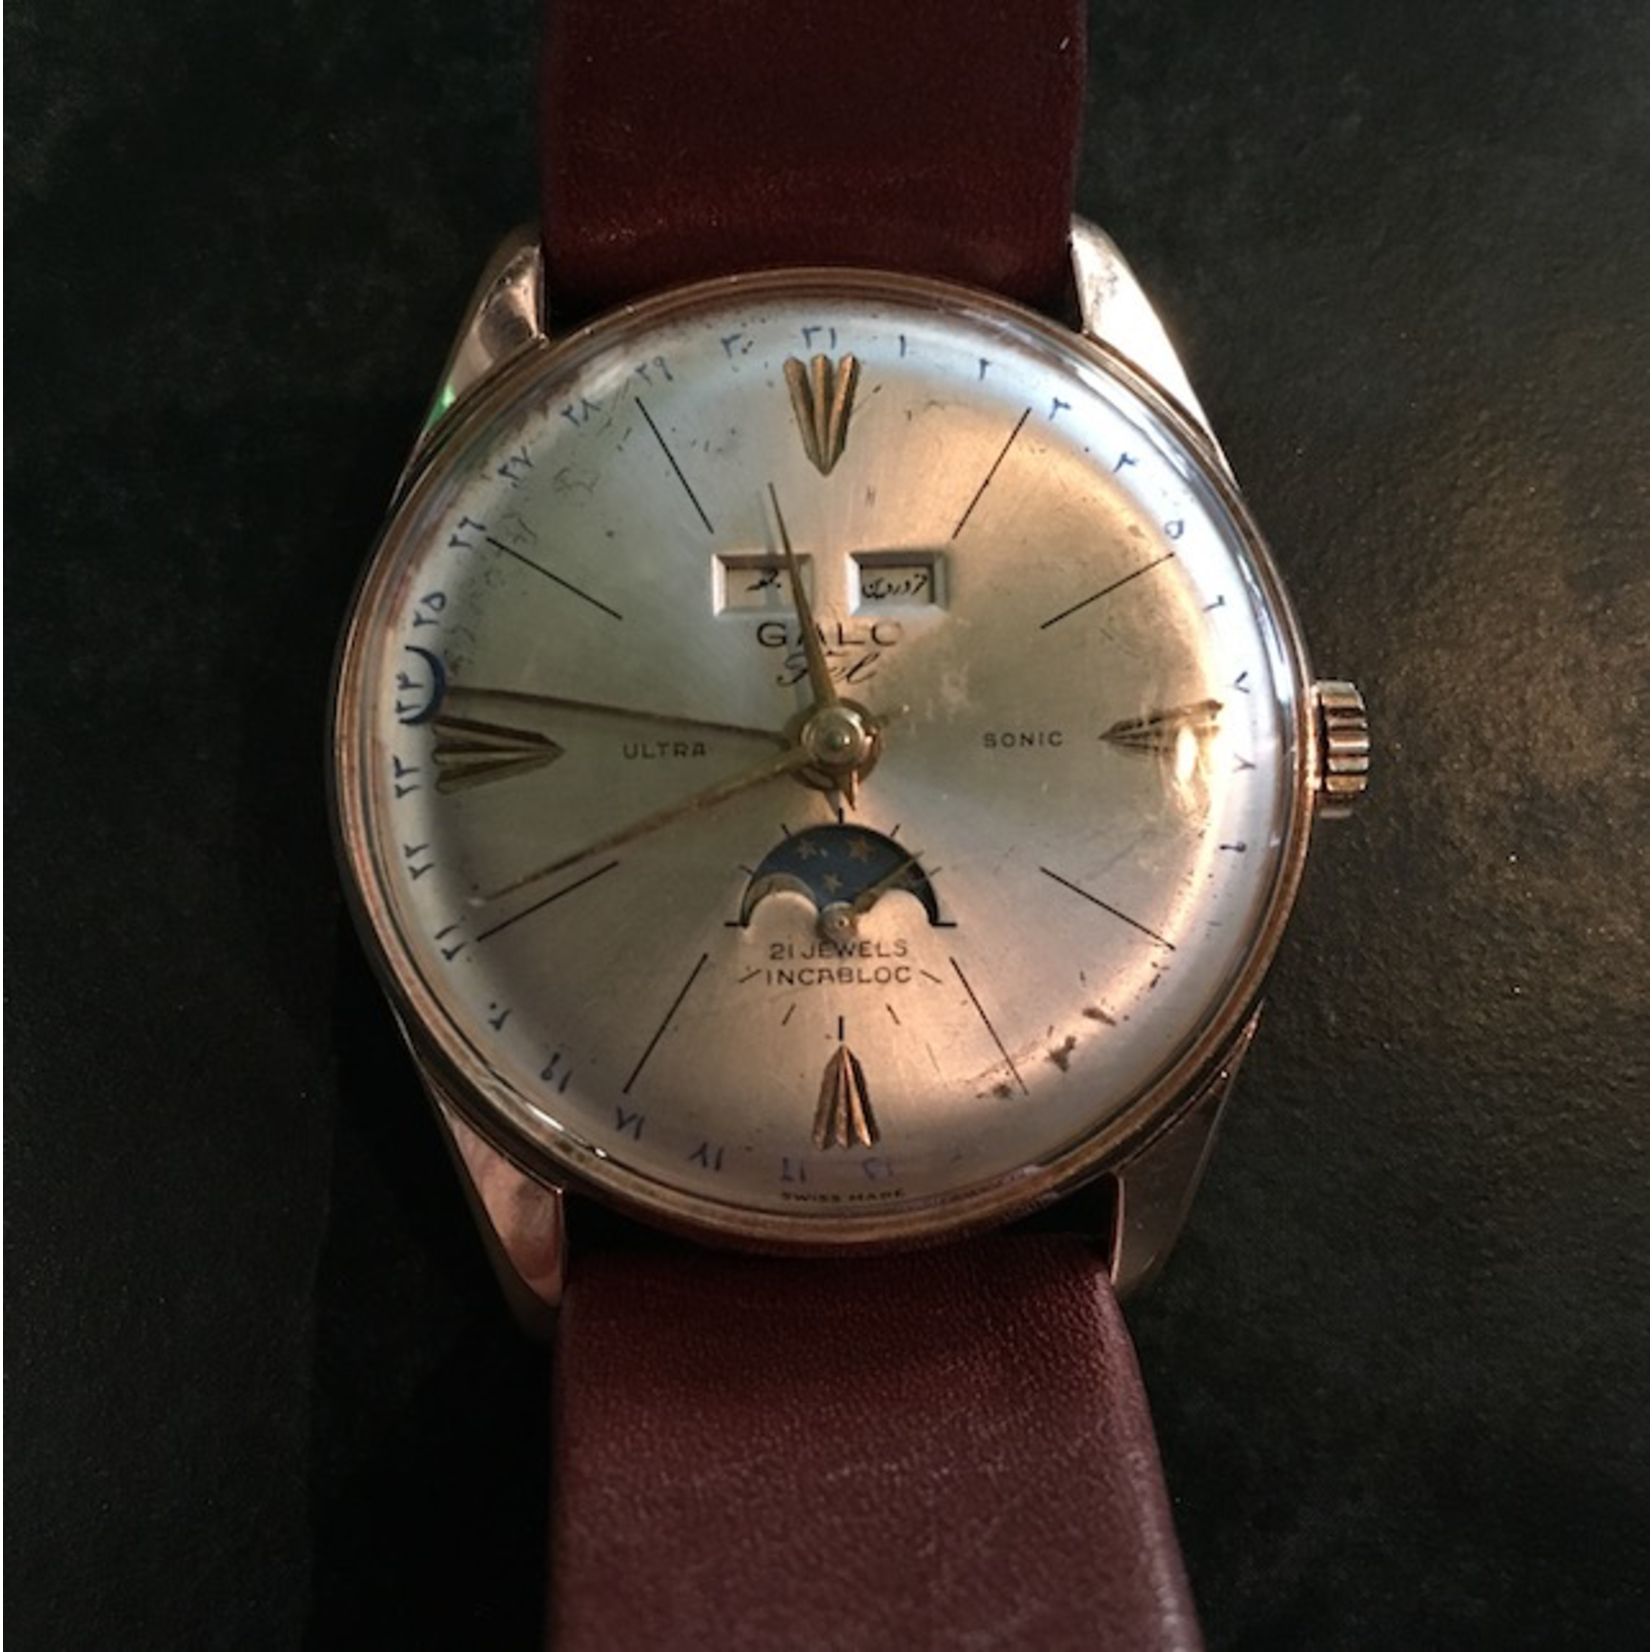 TAJHOME Vintage Watch Galo